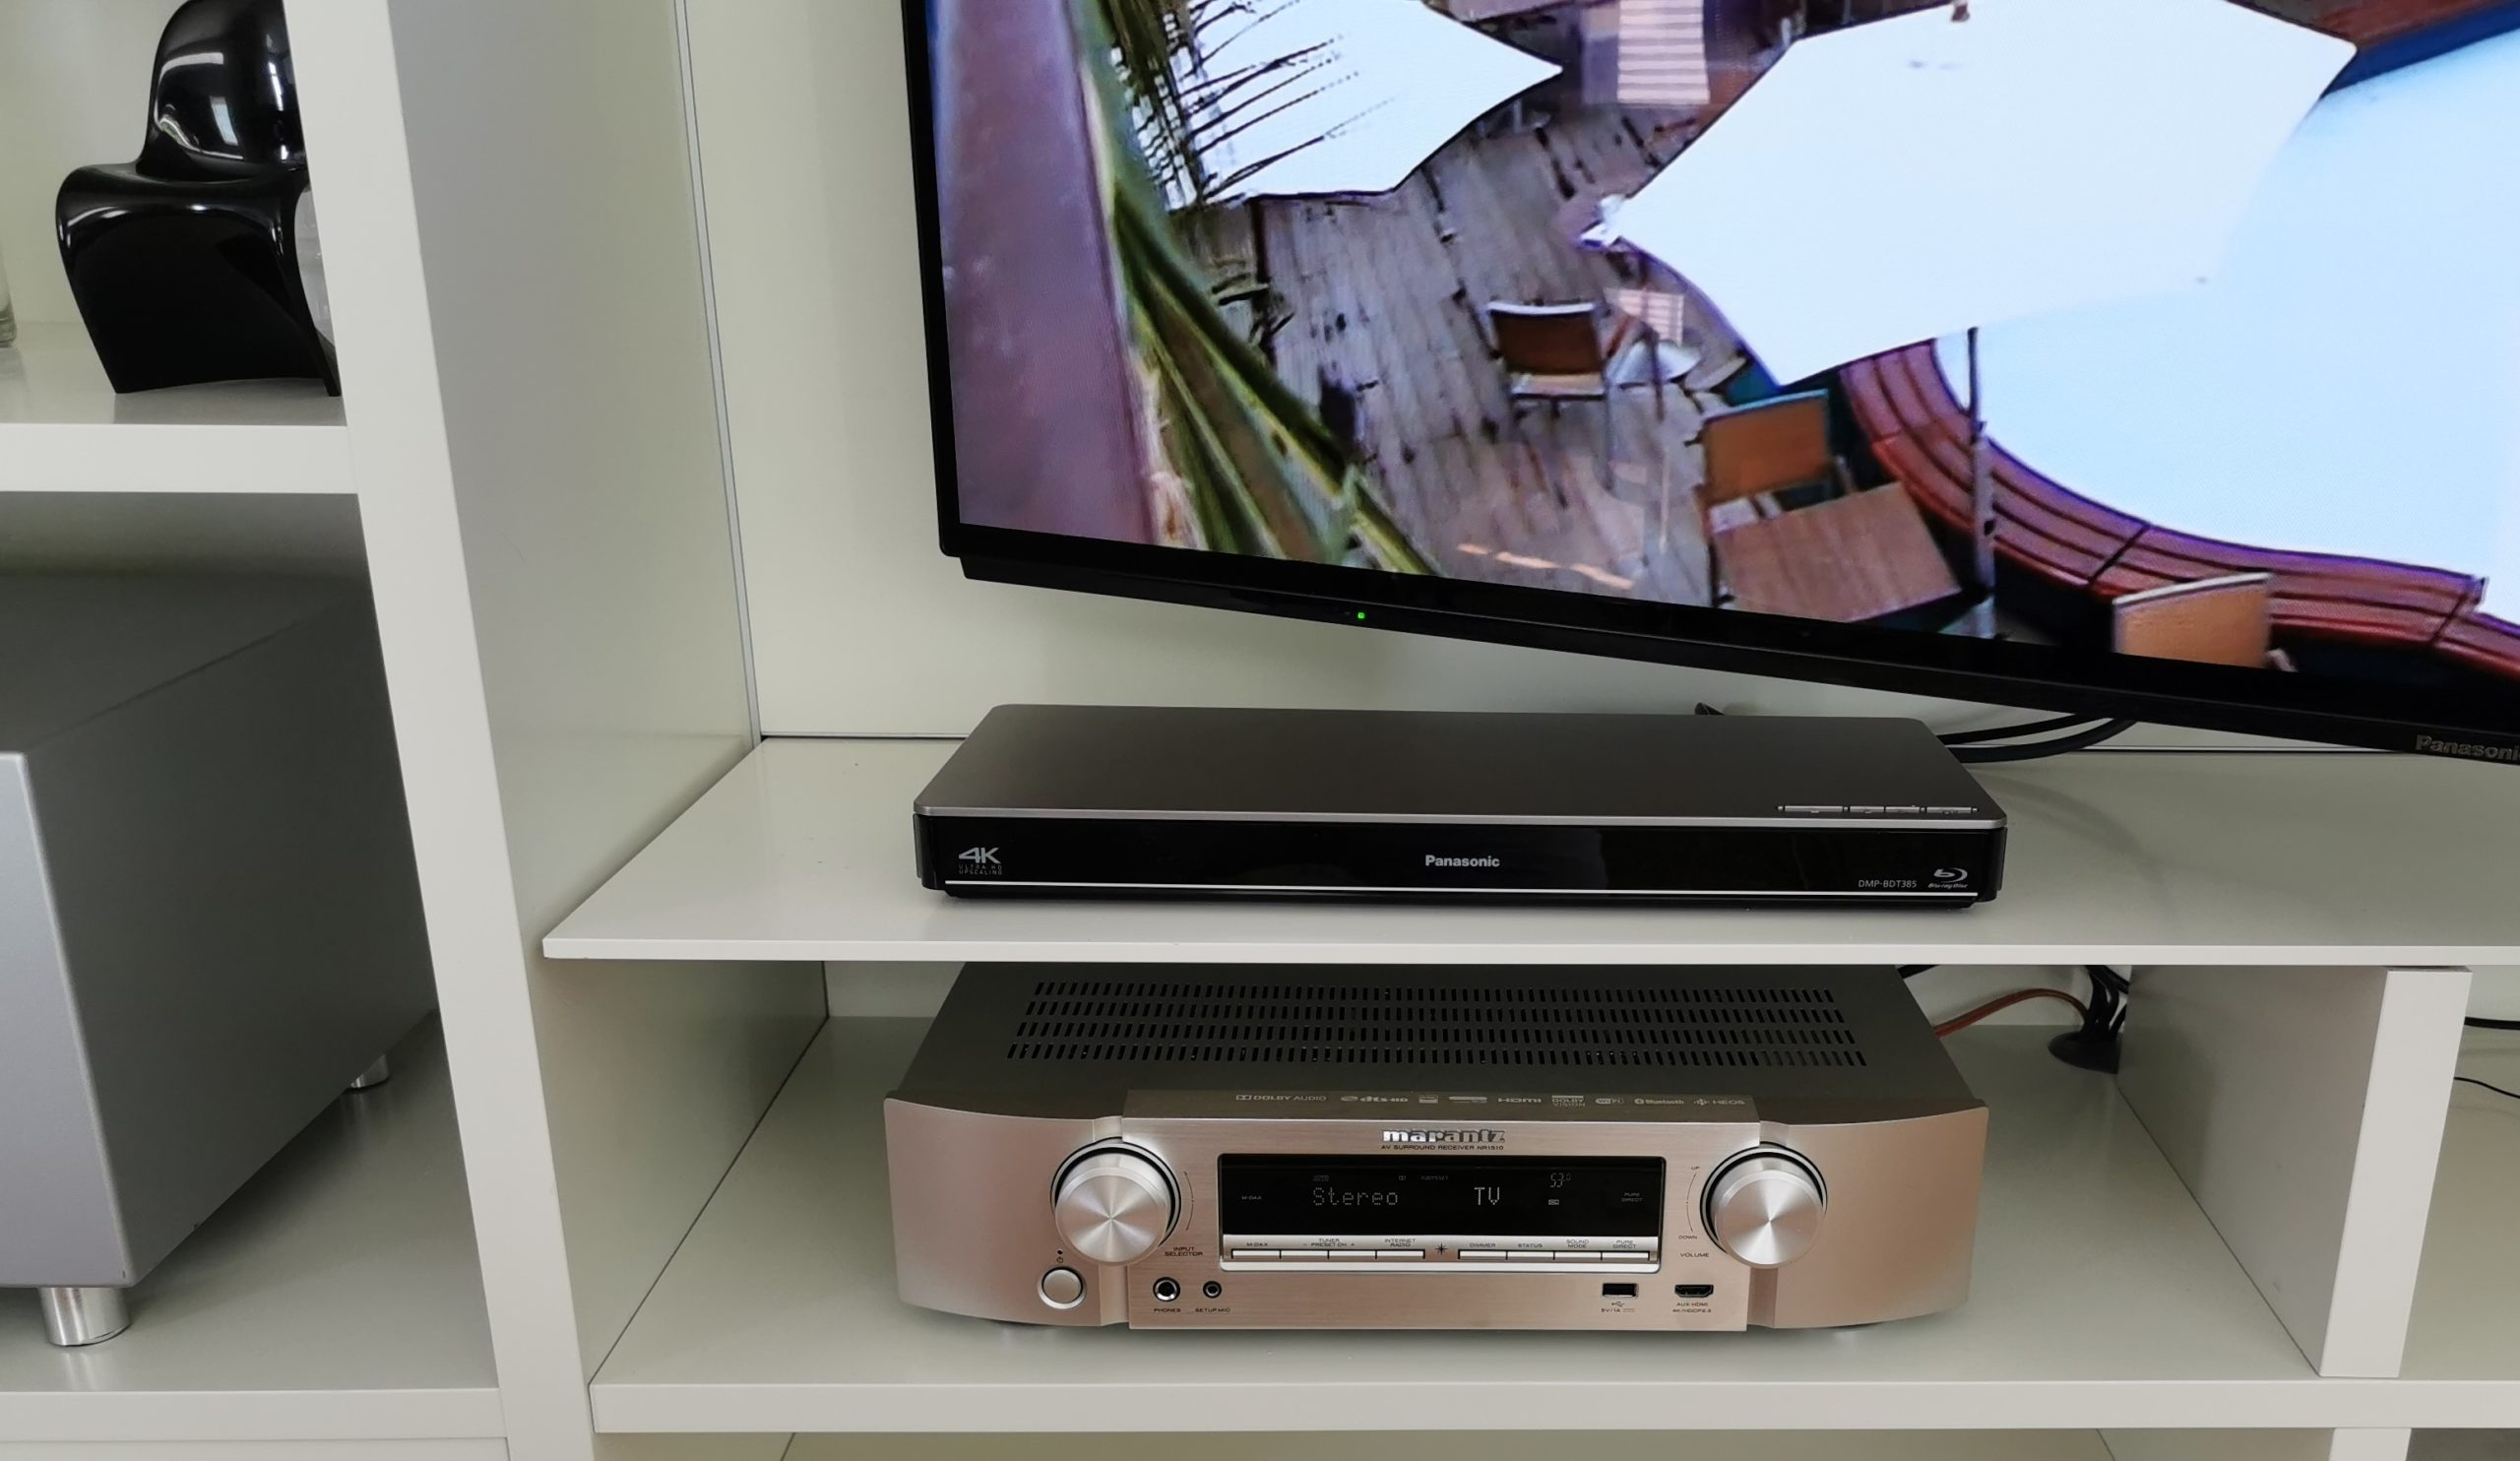 Marantz-SR-1510-und-Panasonic-DMP-BDT385-1